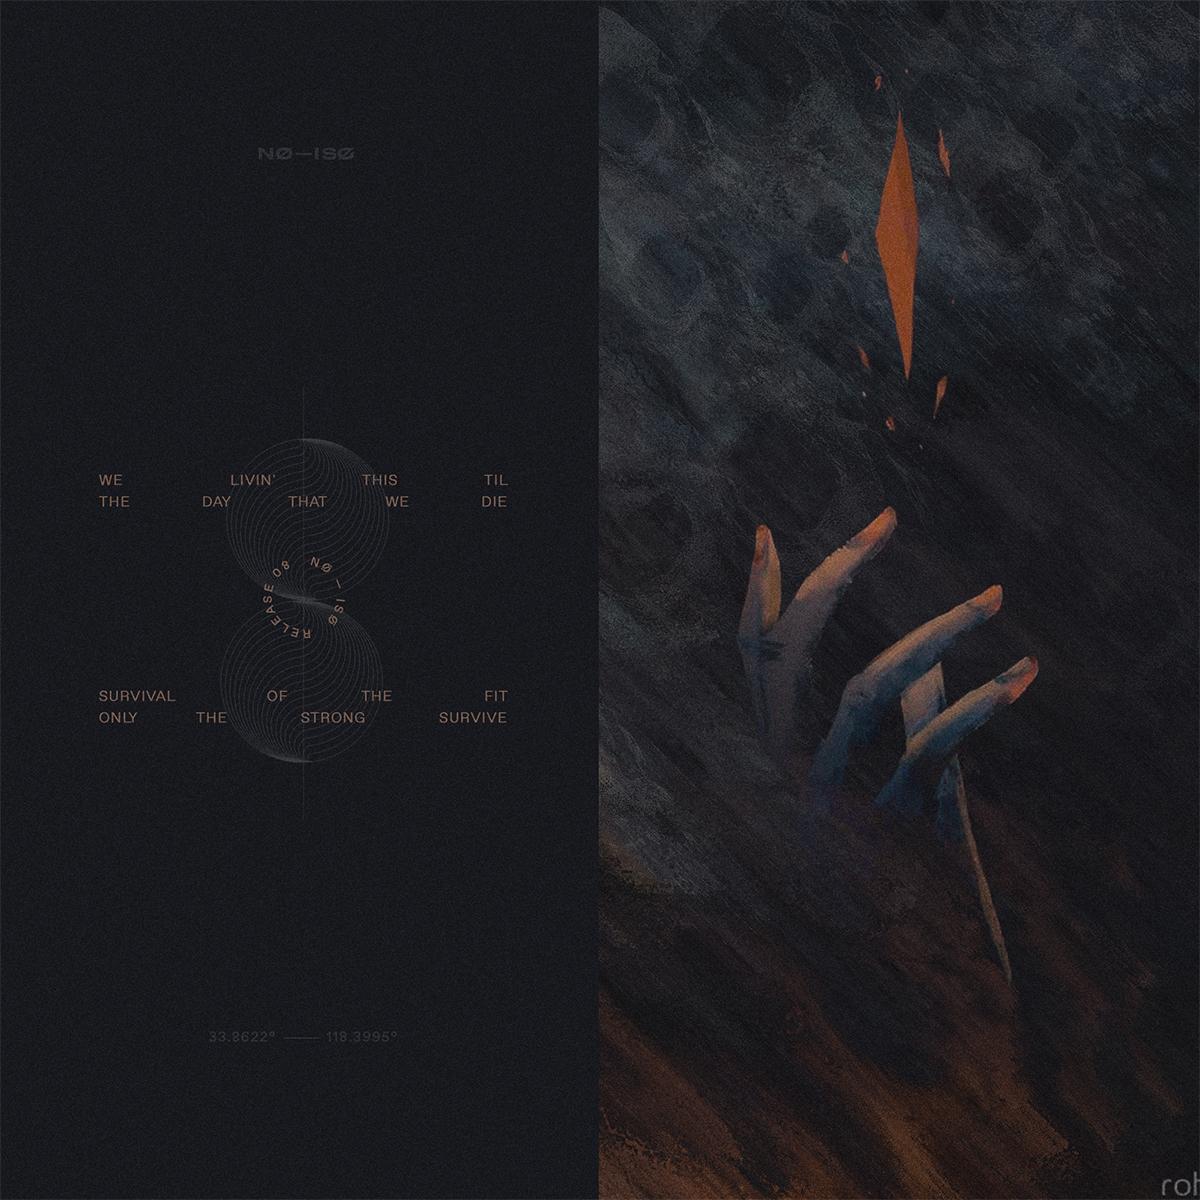 No iso album cover release08